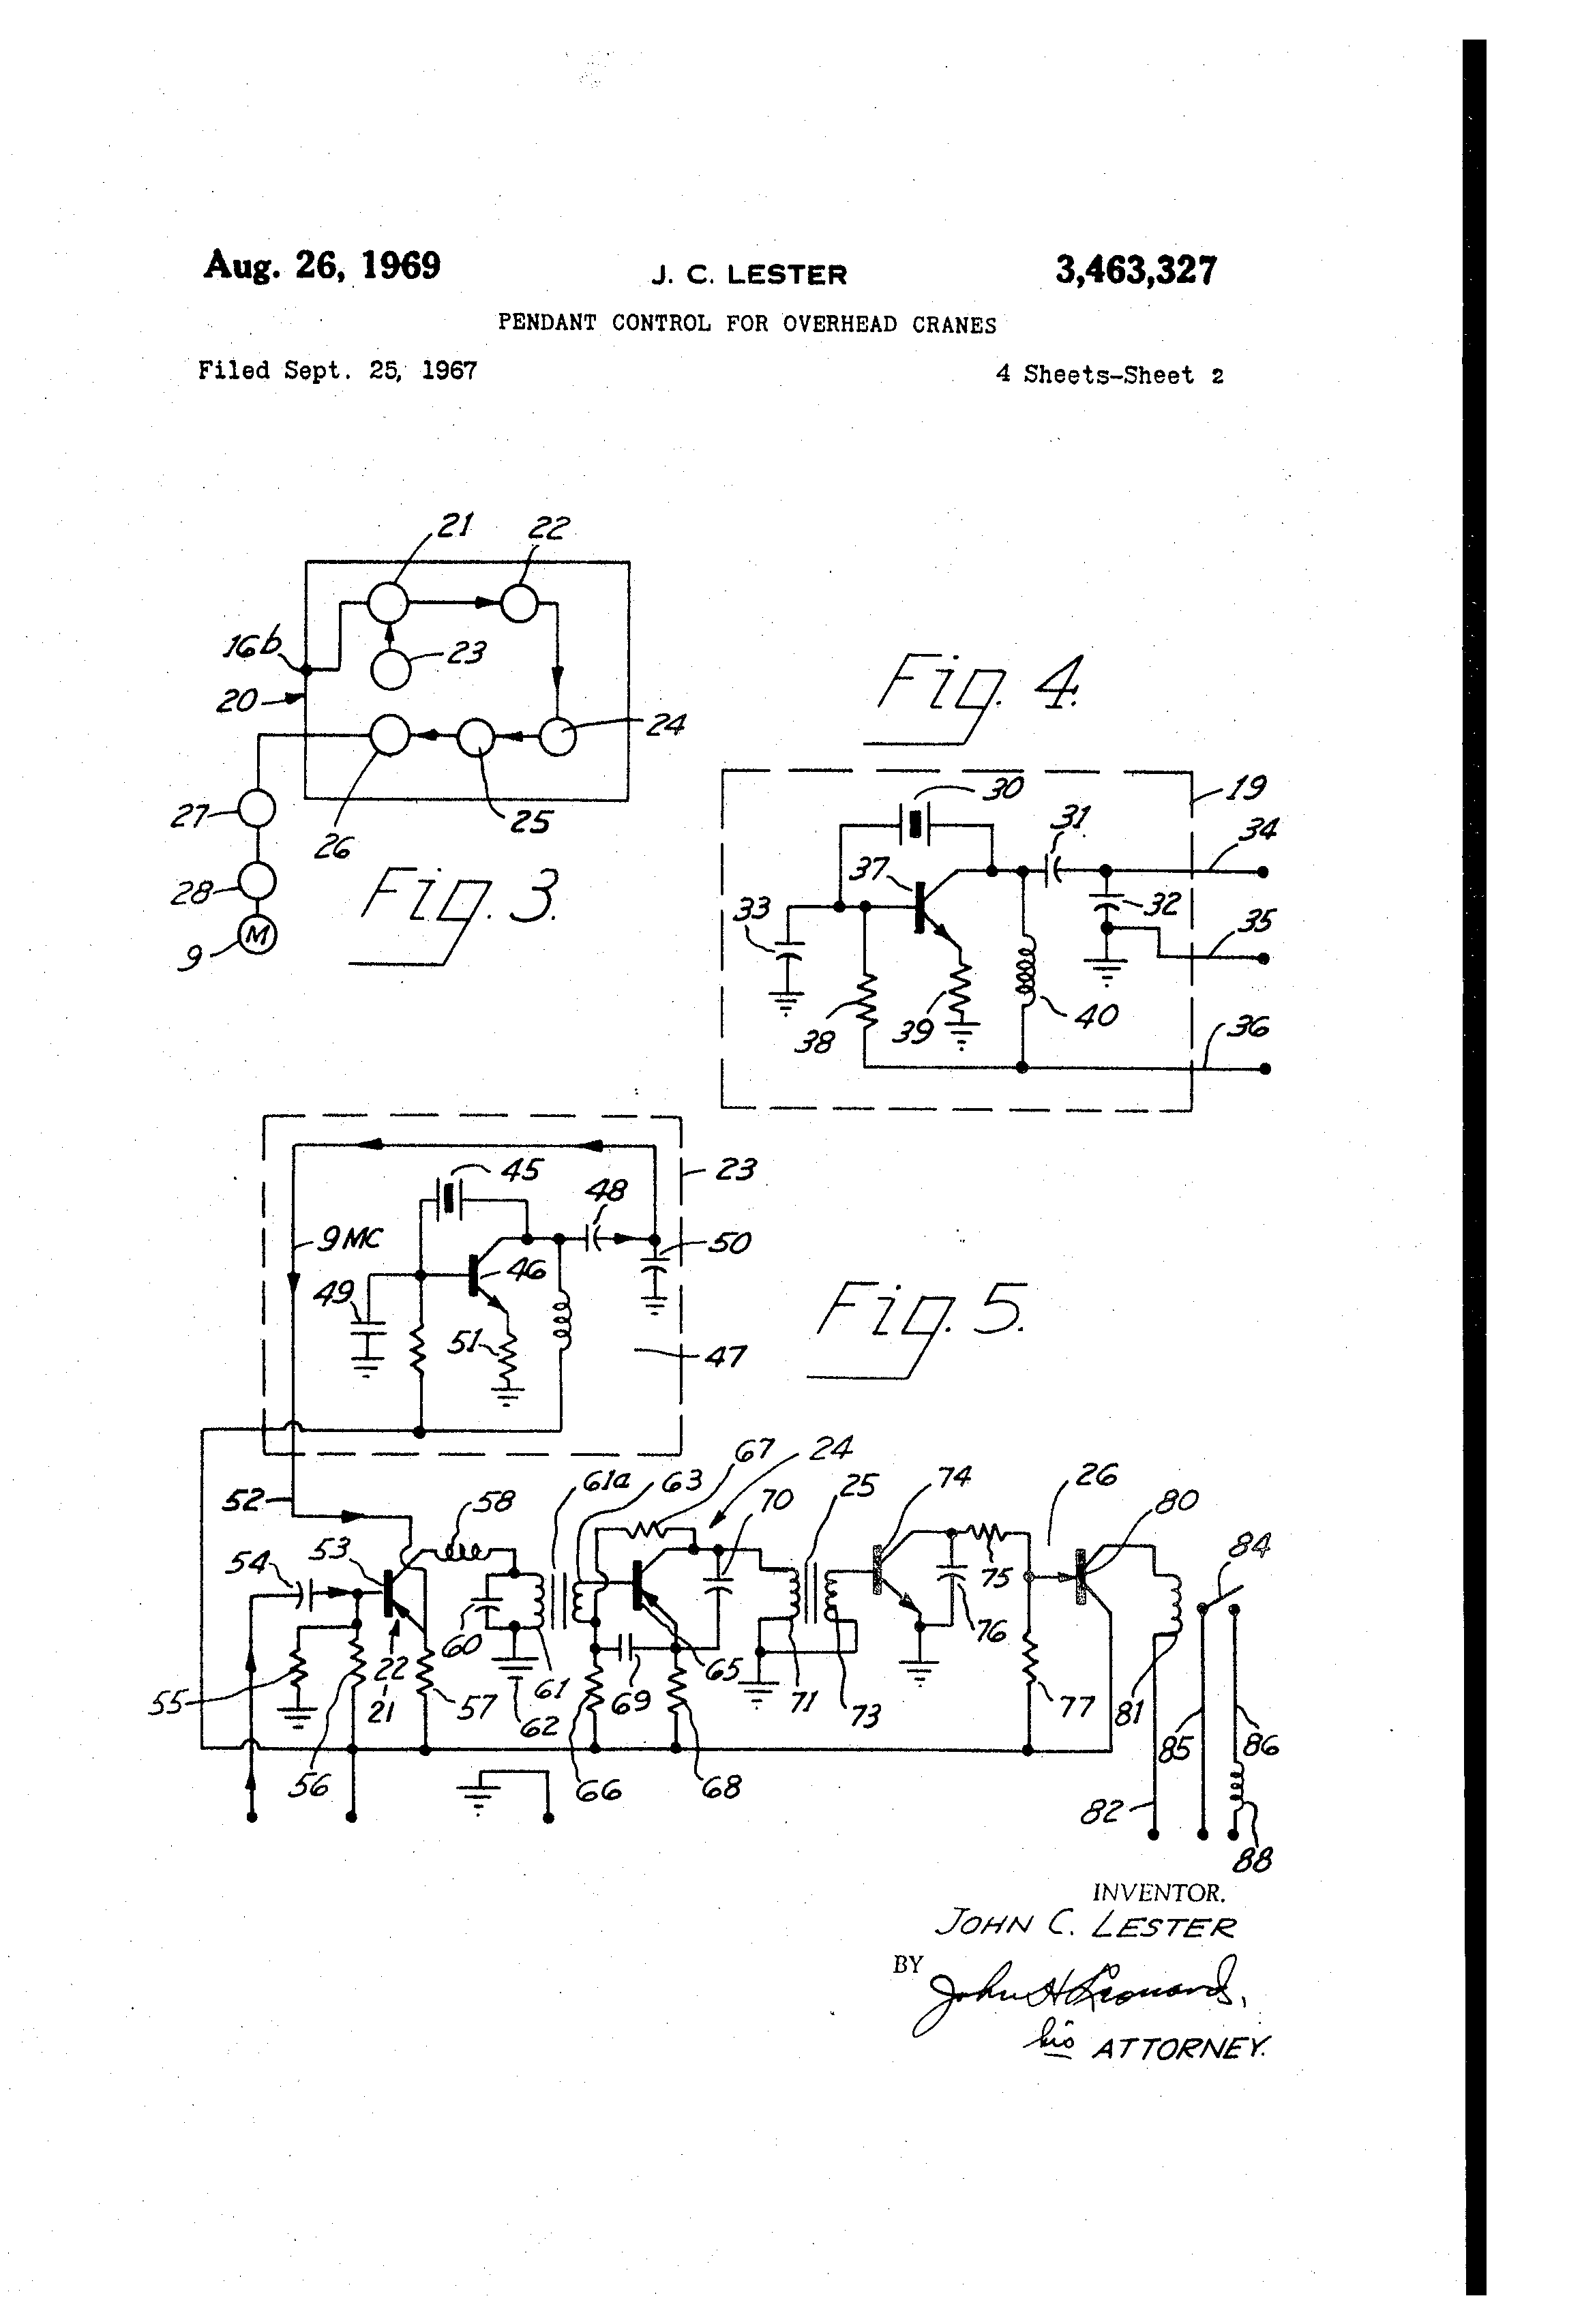 Overhead Crane Demag Wiring Diagram Pdf 5 Wire Starter Wiring Diagram Relays Jeep Podewiring Kankubuktikan Jeanjaures37 Fr